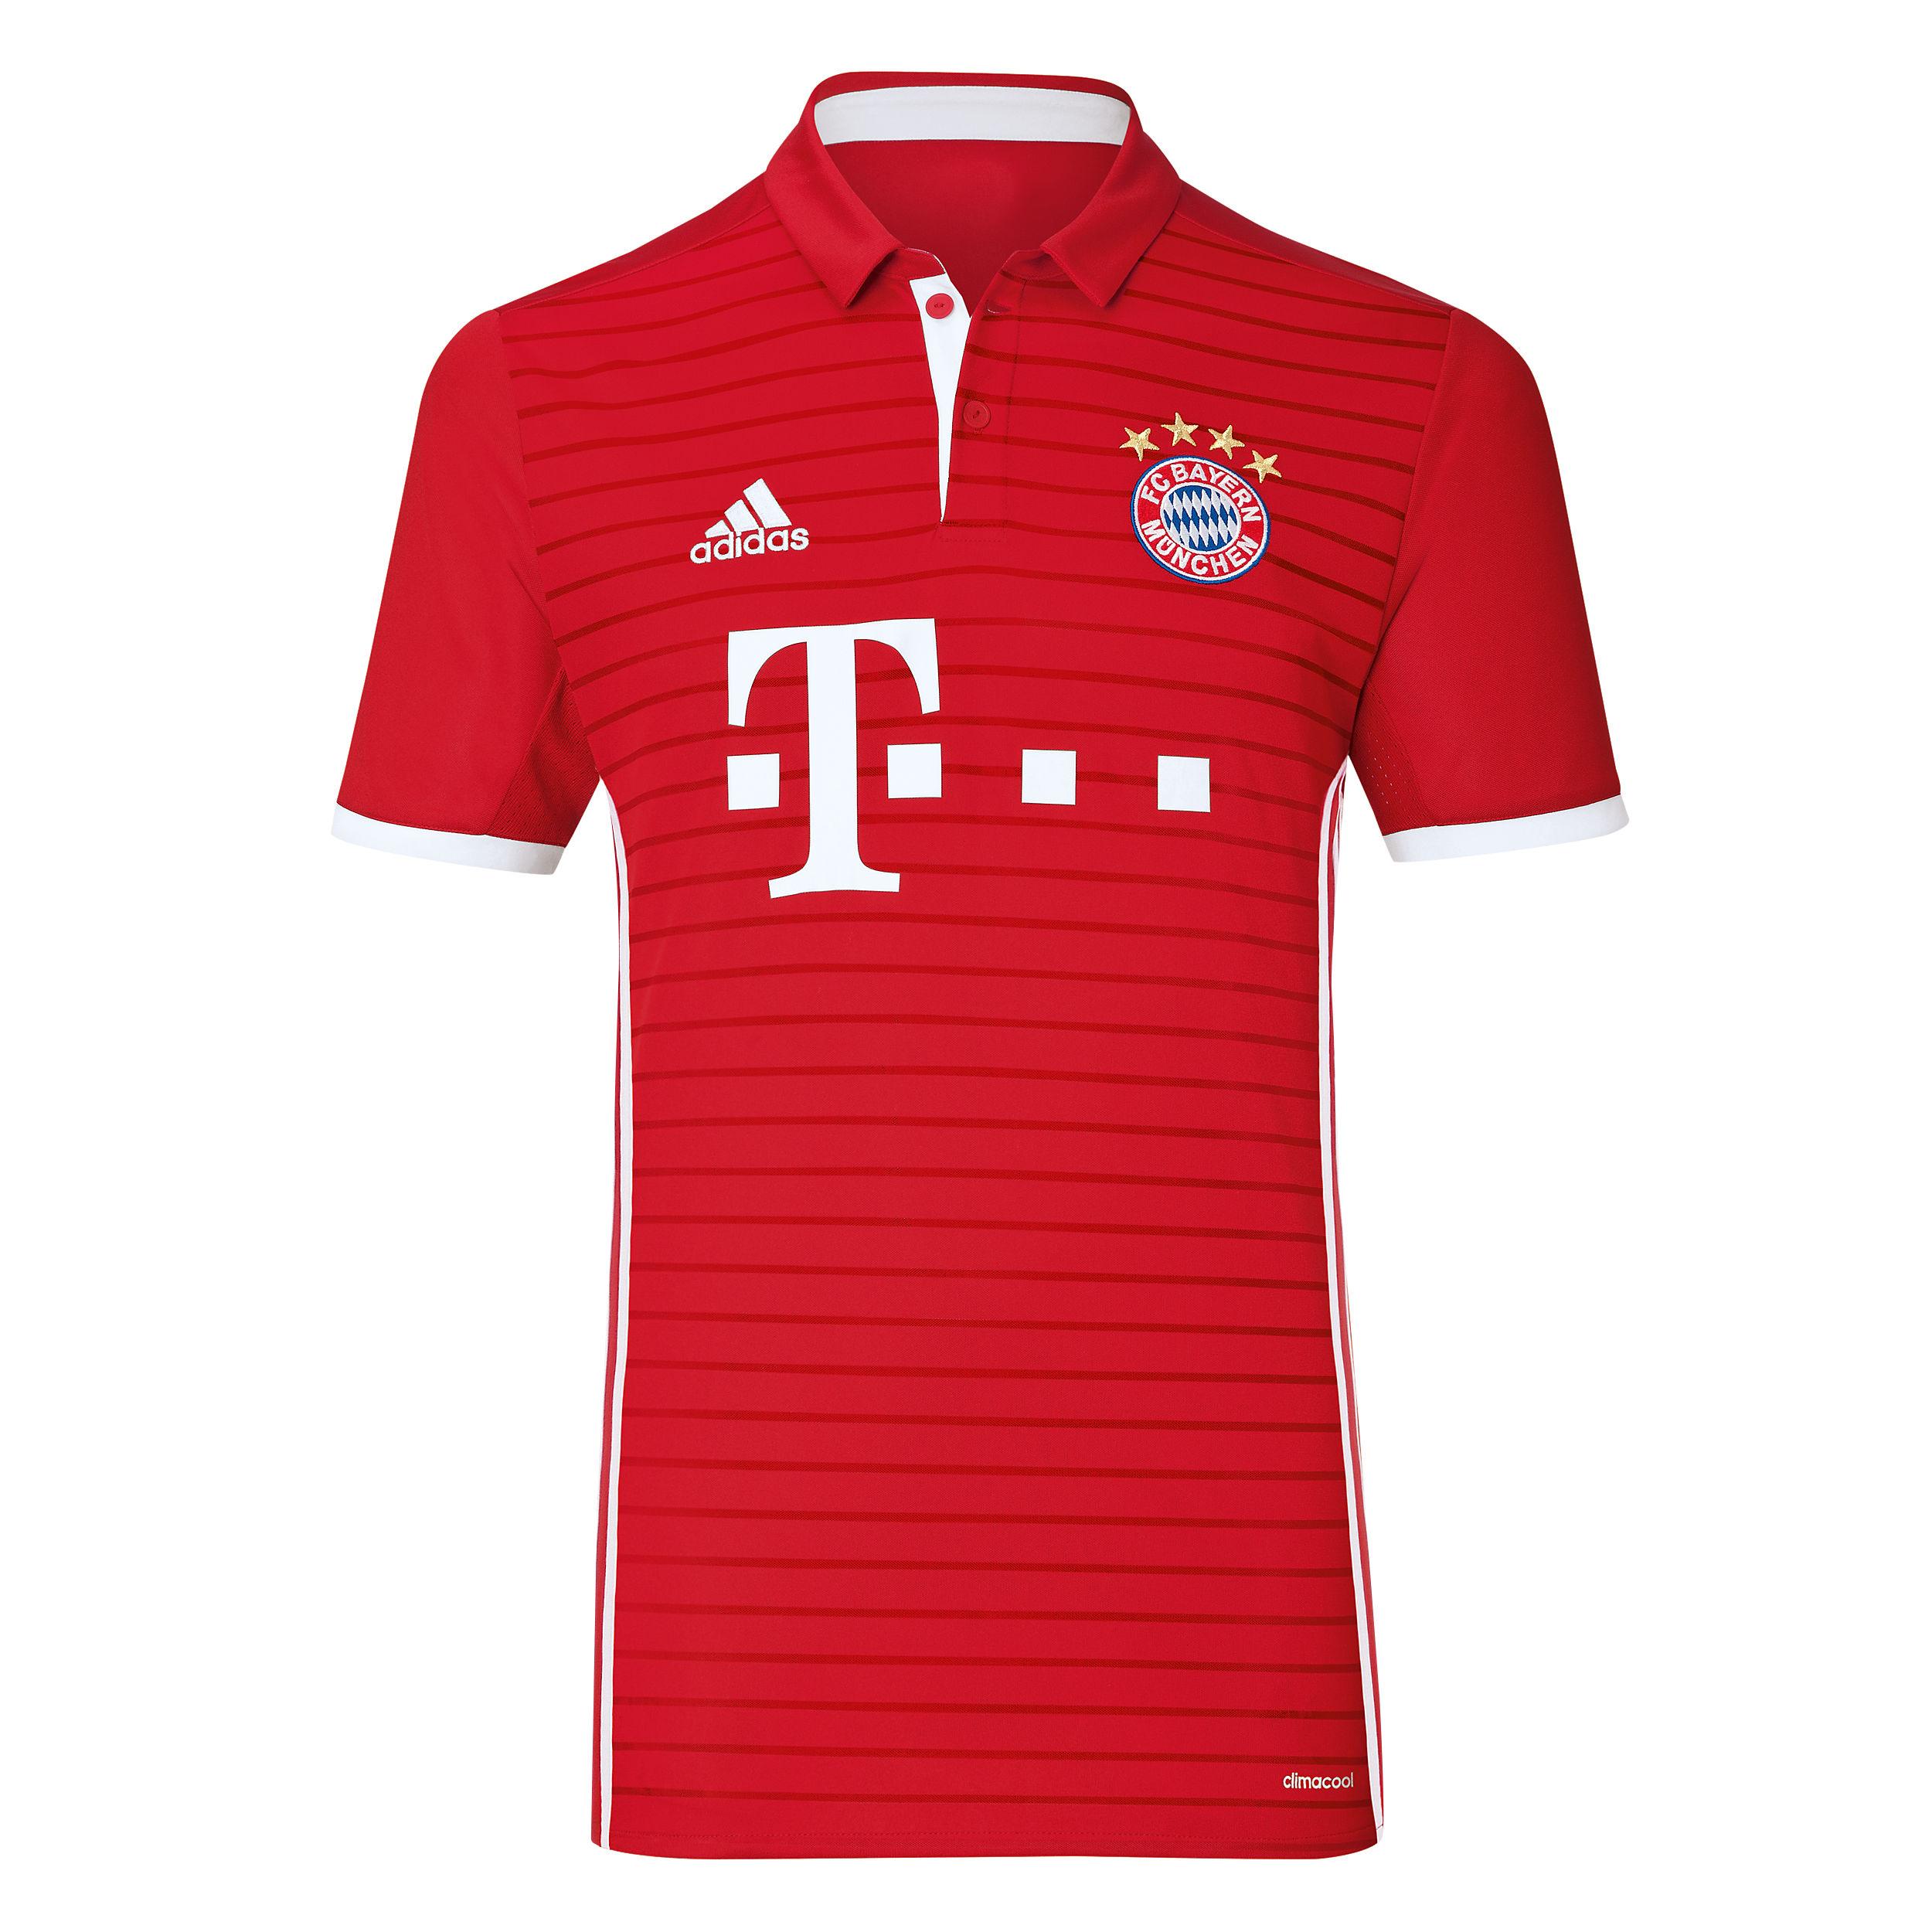 fc bayern shirt home 1617 official fc bayern online store womens thiago alcantara fc bayern munich 1